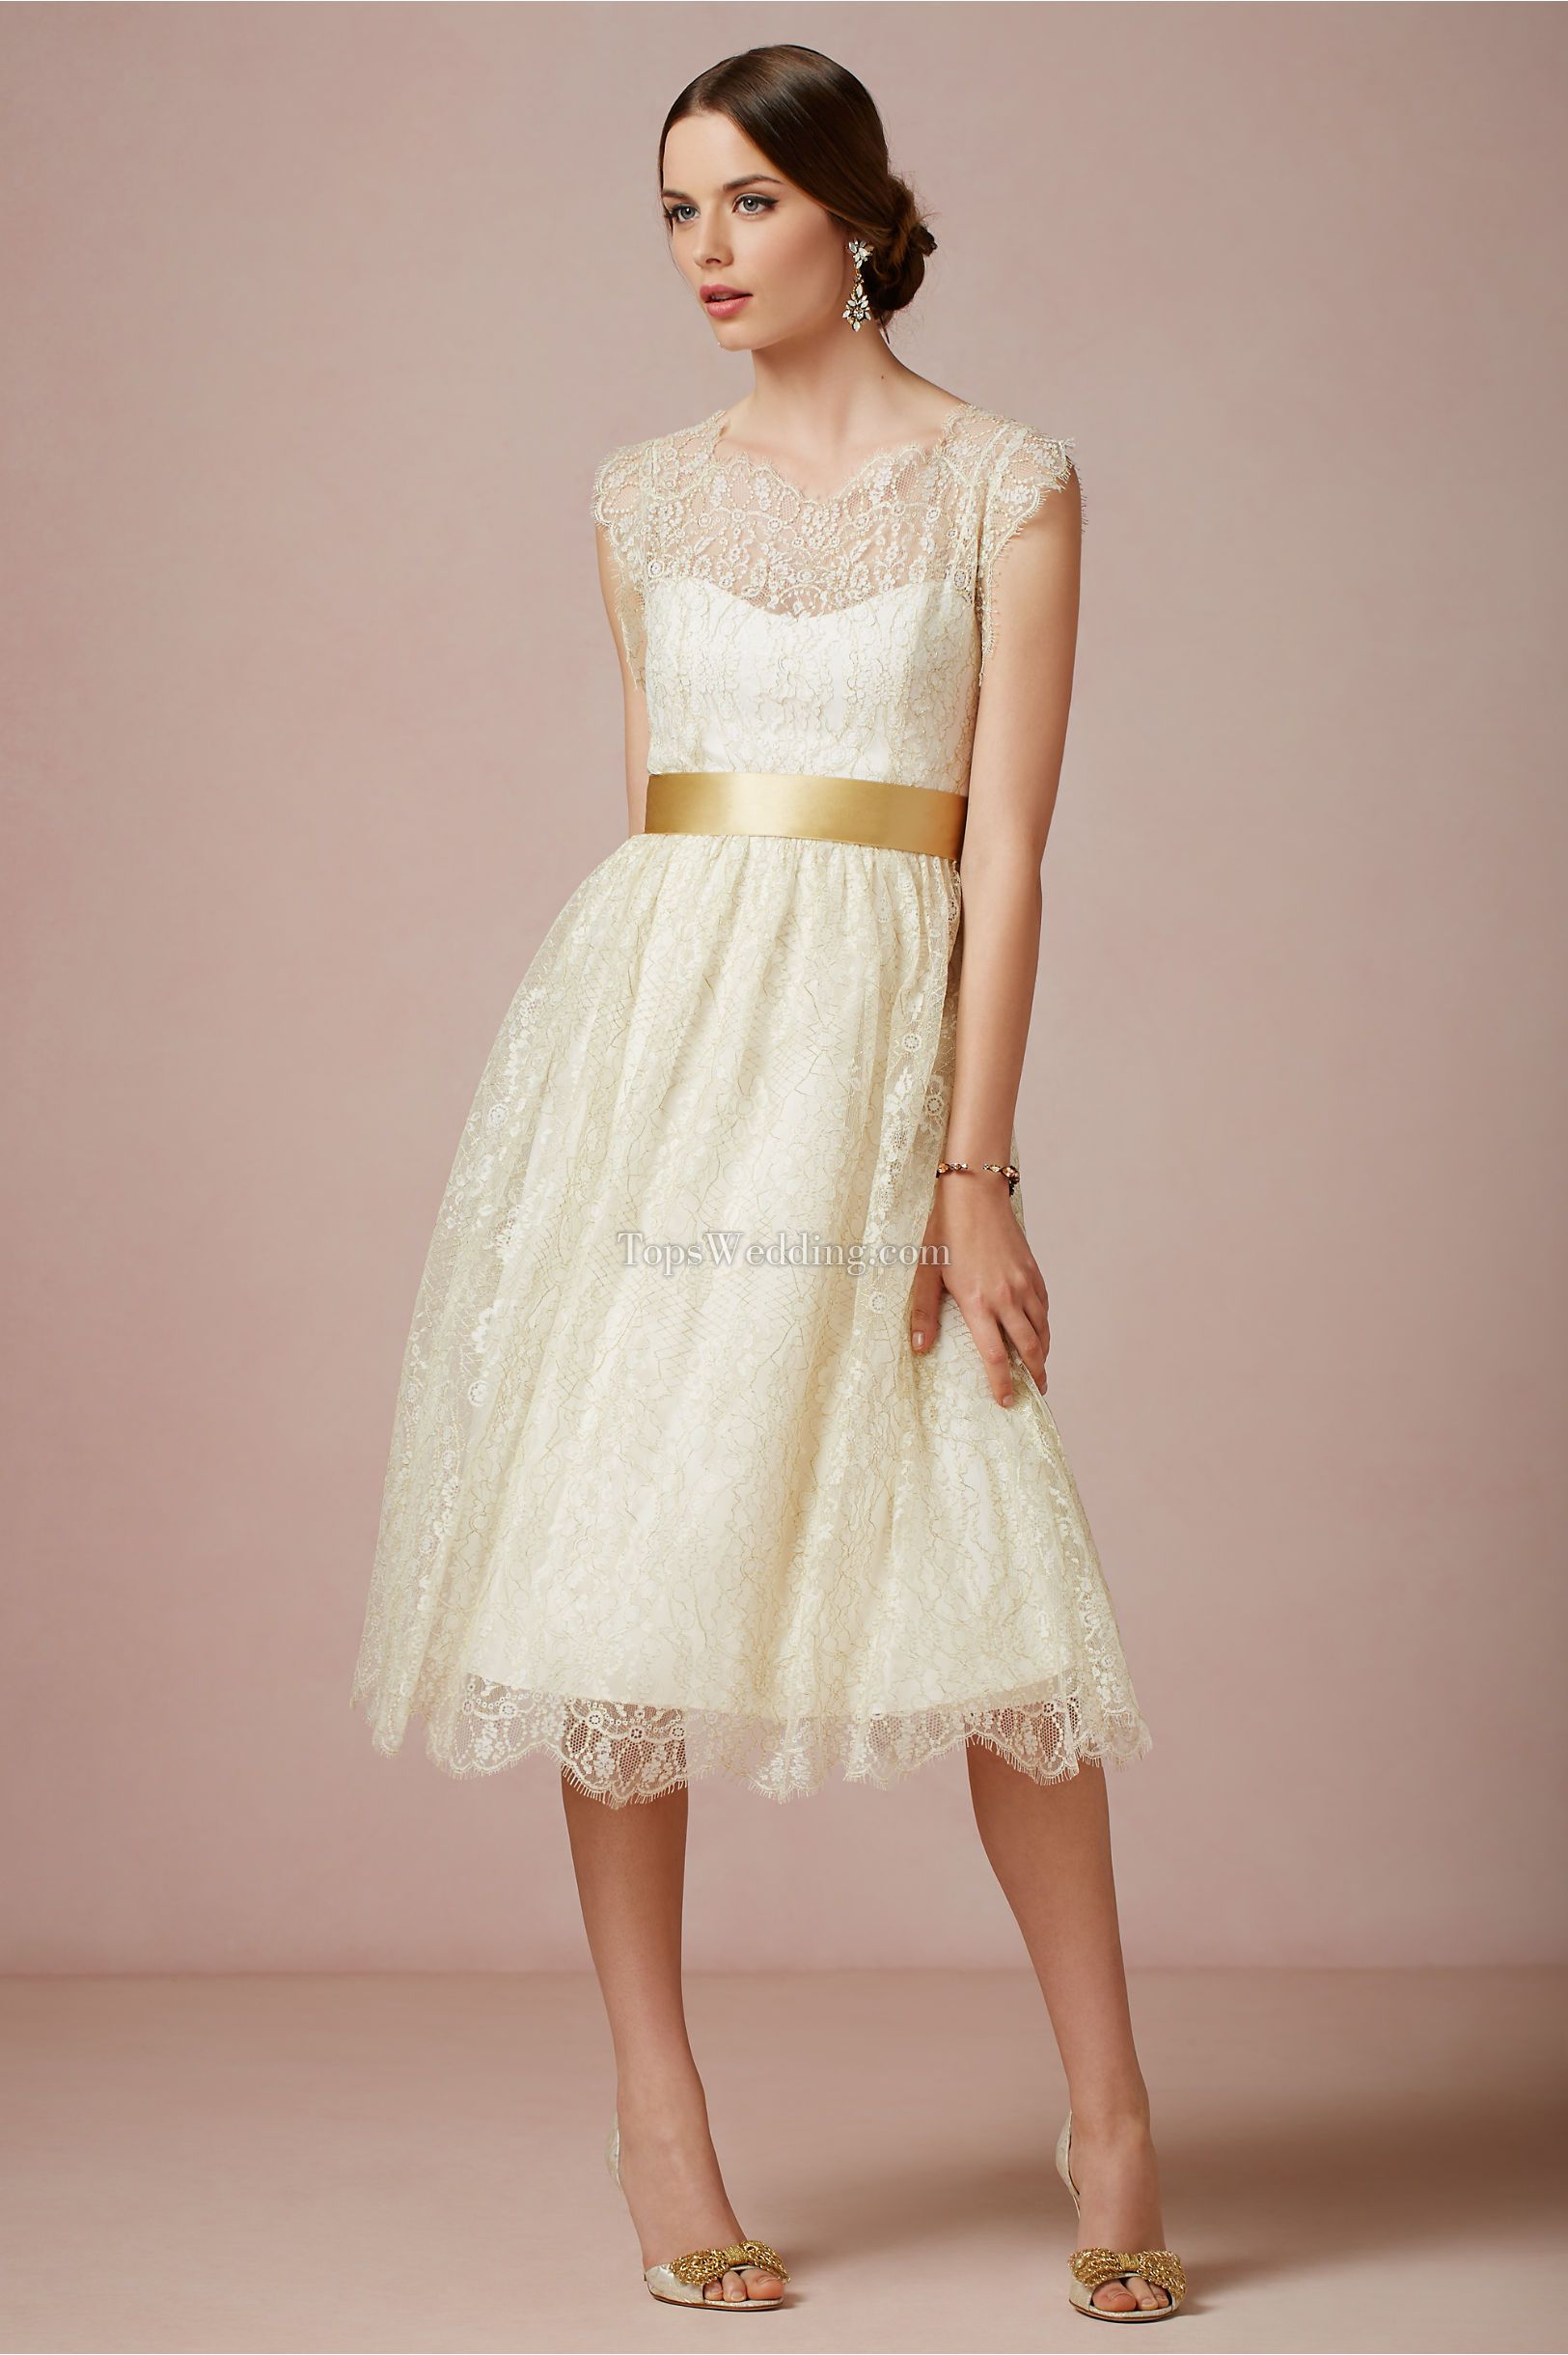 Cute short wedding dresses  Fashion Champagne lace Bridesmaid Dresses with cute sash